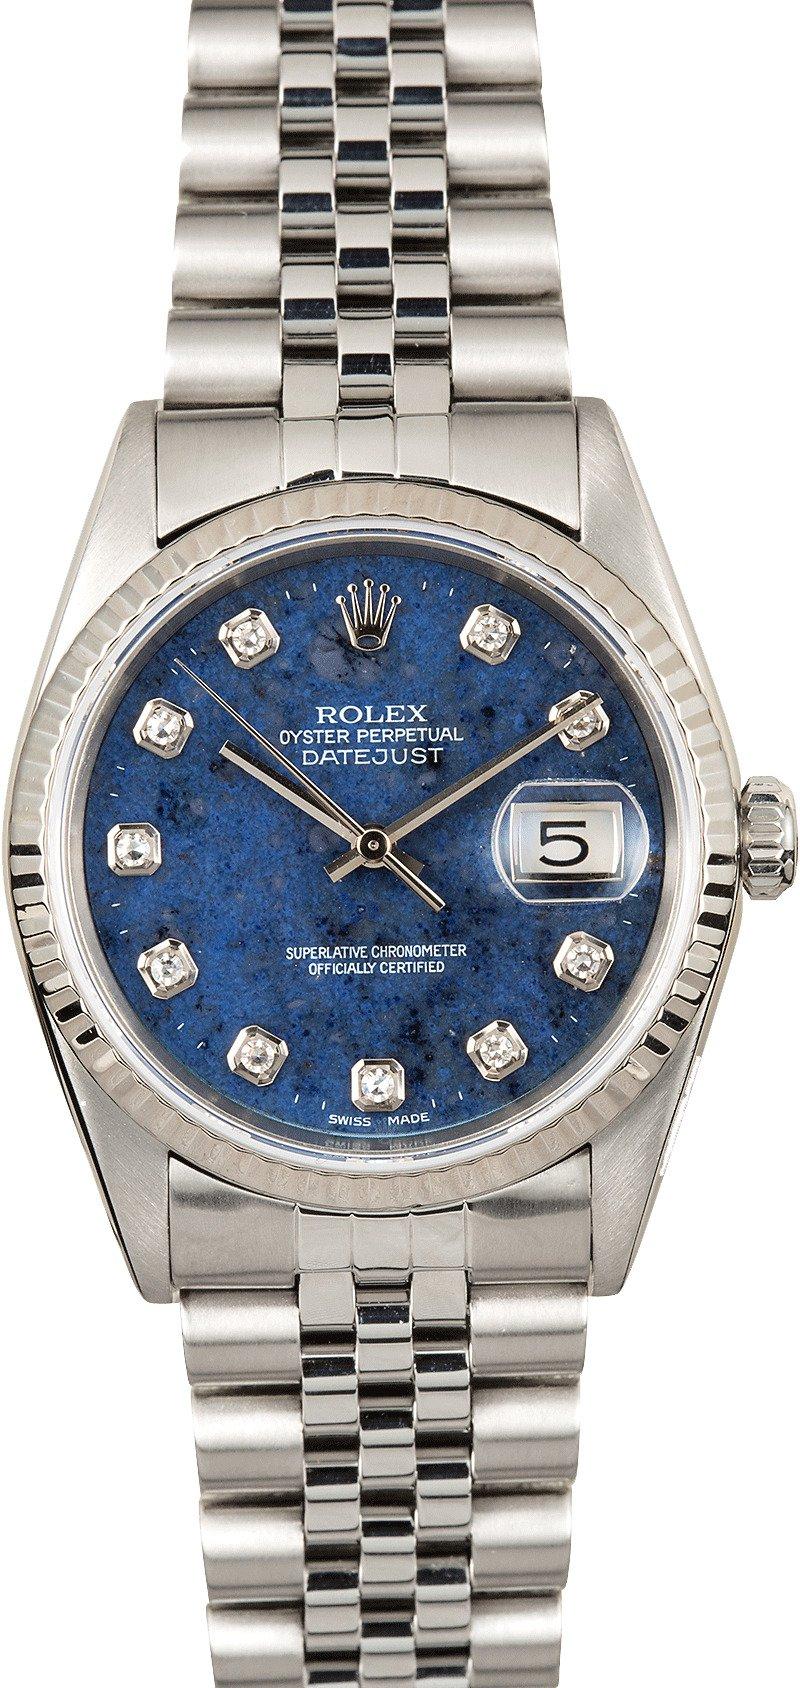 Rolex Datejust 16234 Diamond Sodalite Dial